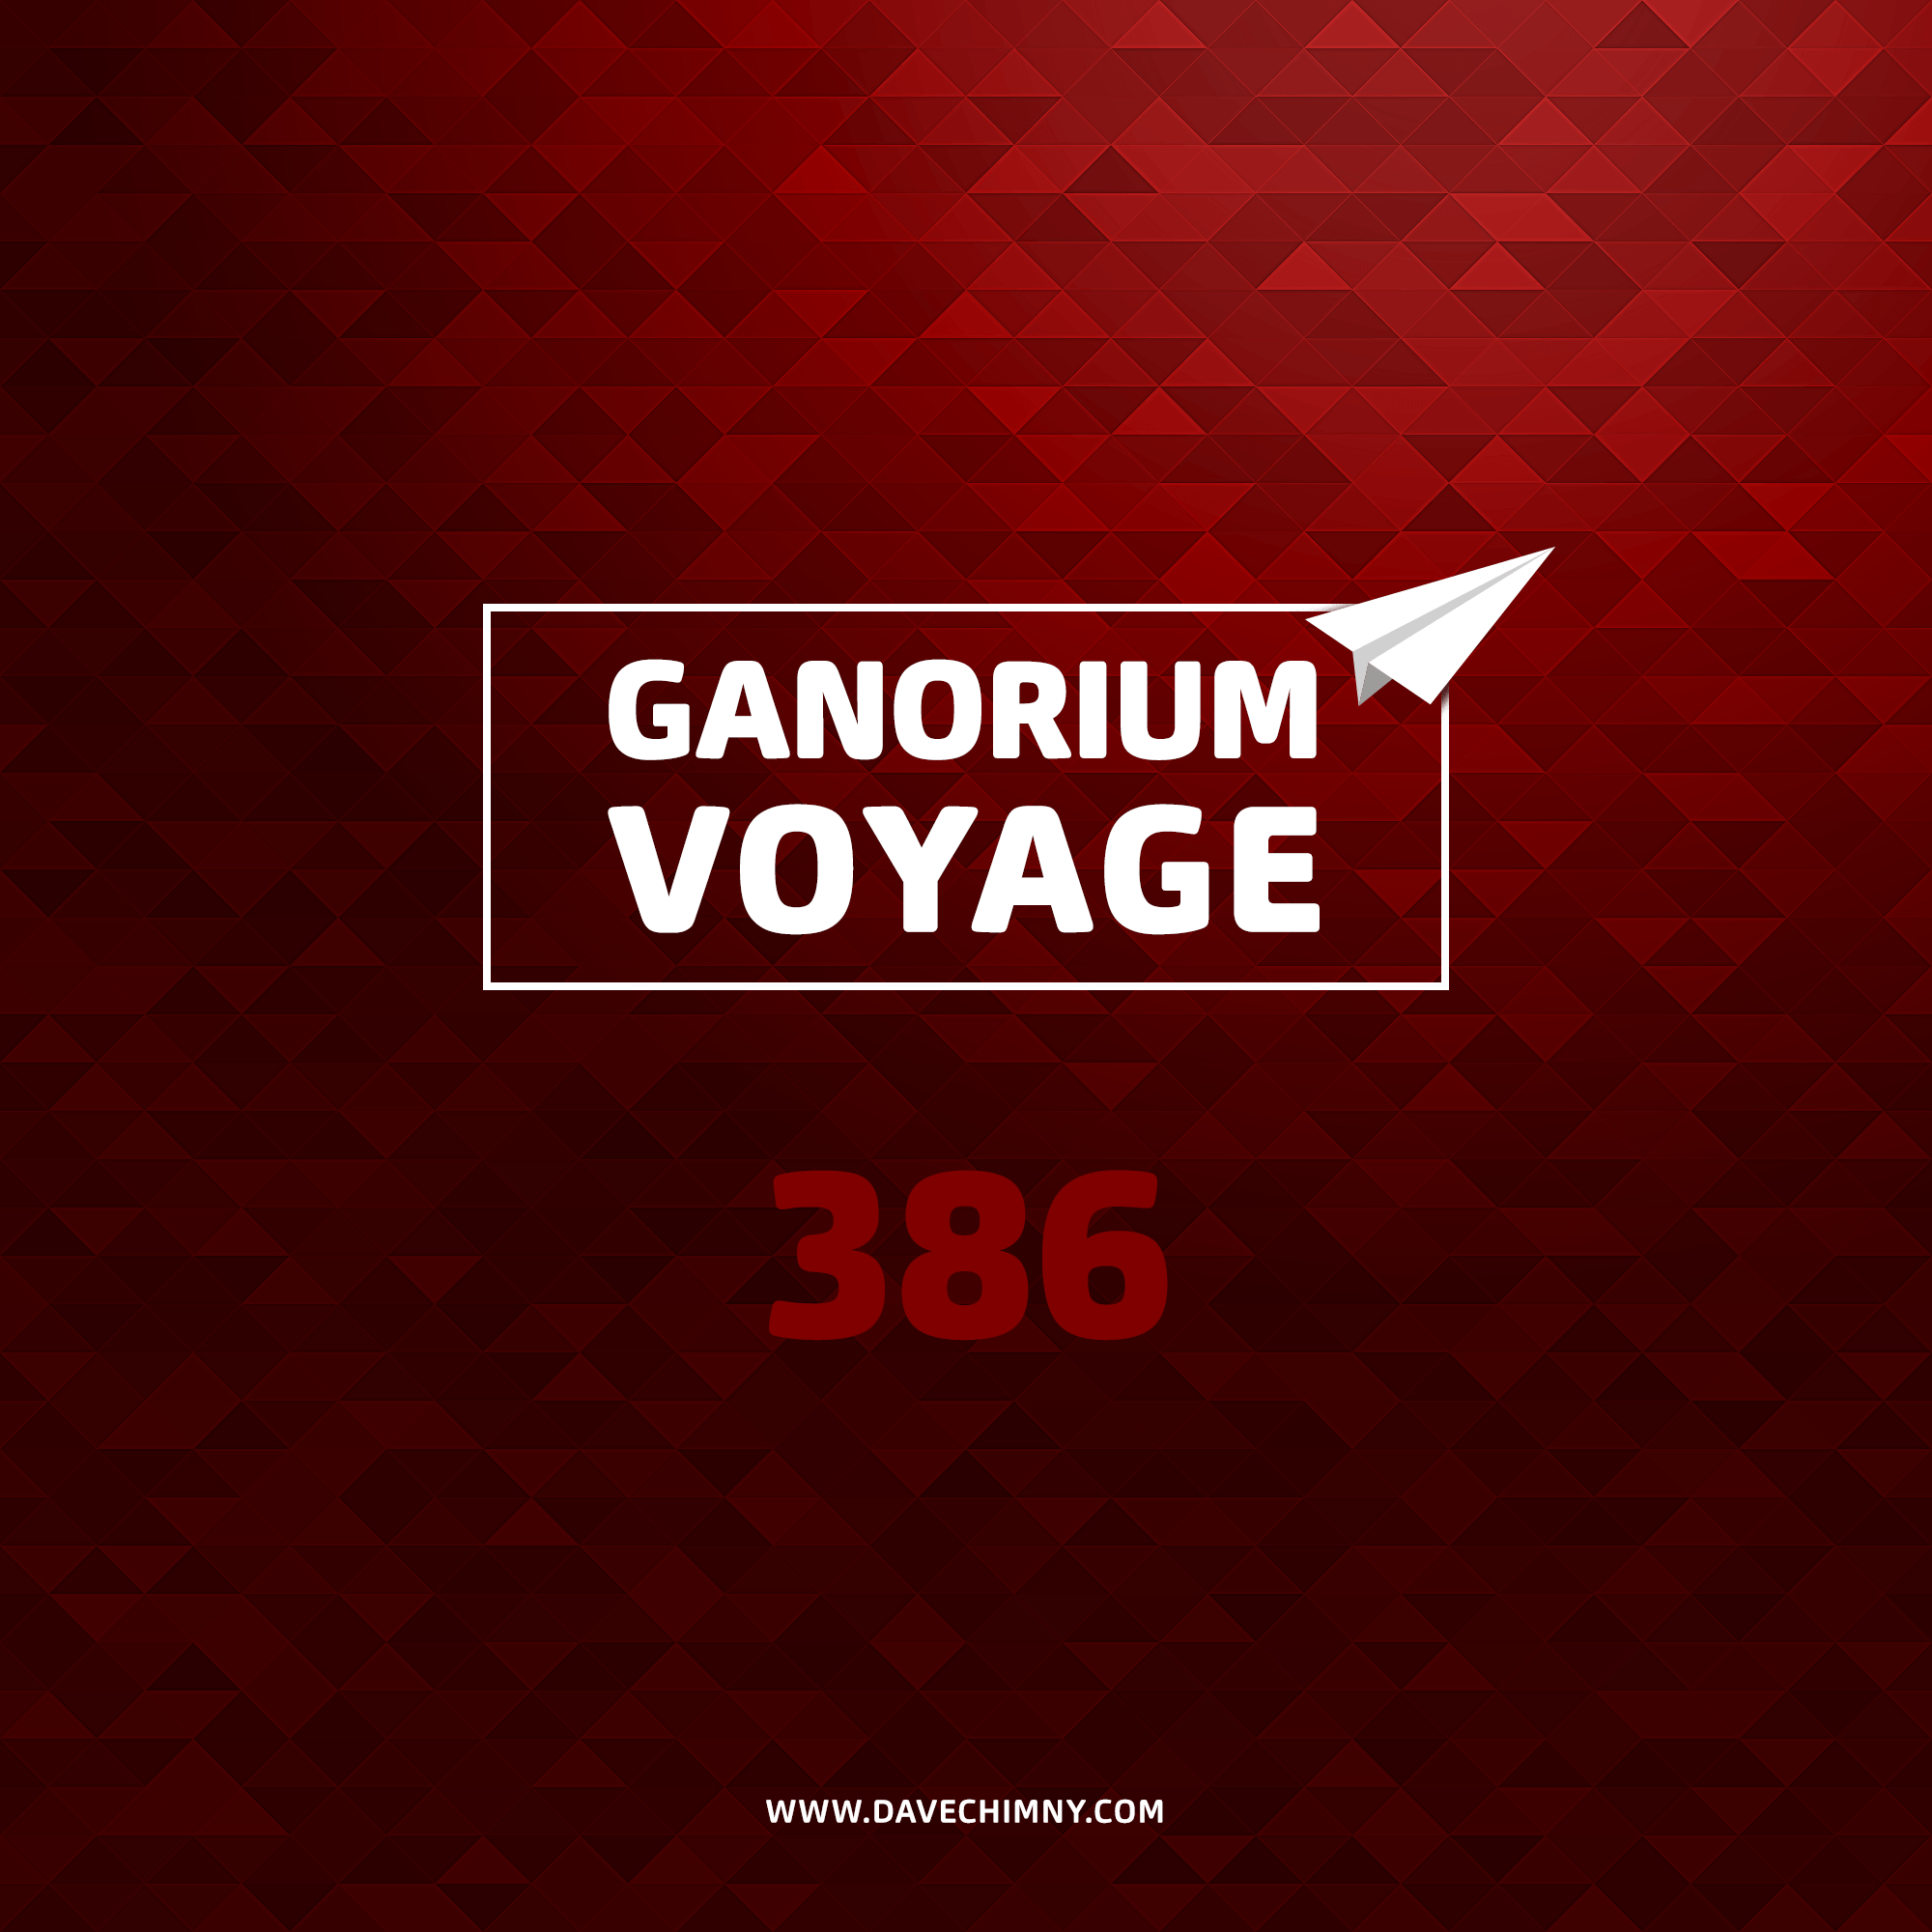 Dave Chimny – Ganorium Voyage 386